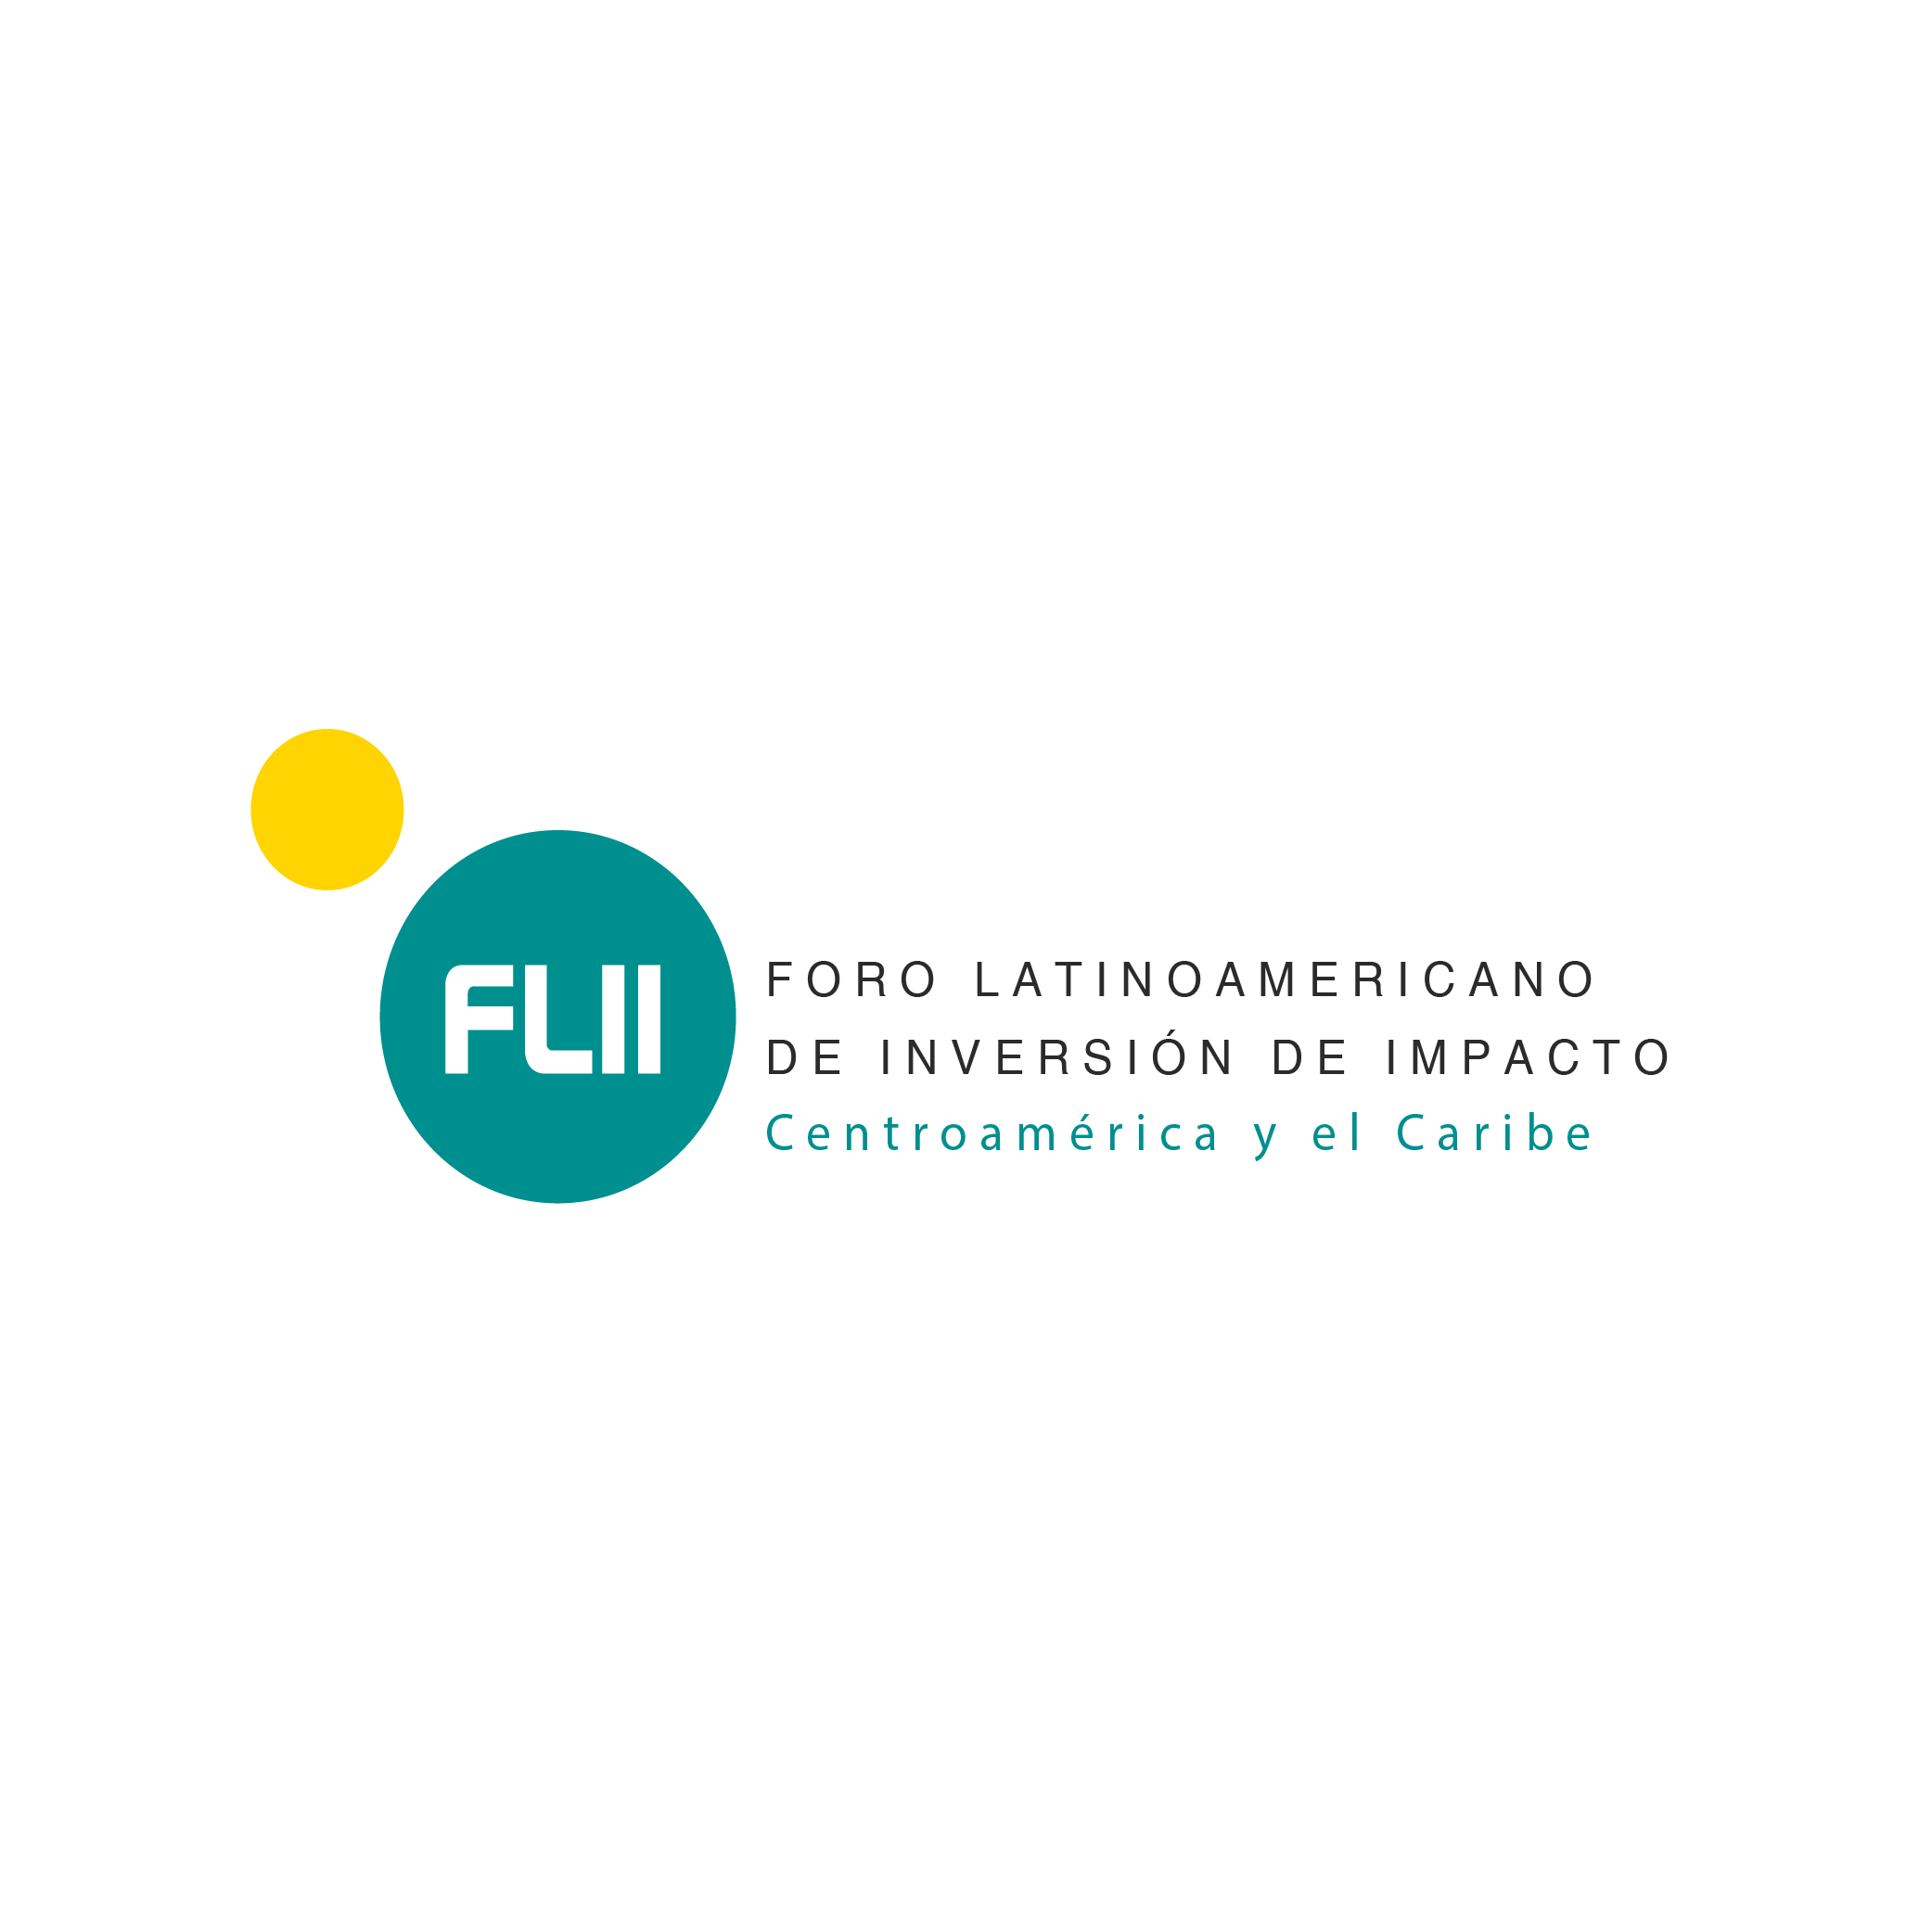 Logos Pagina Web FLII-02